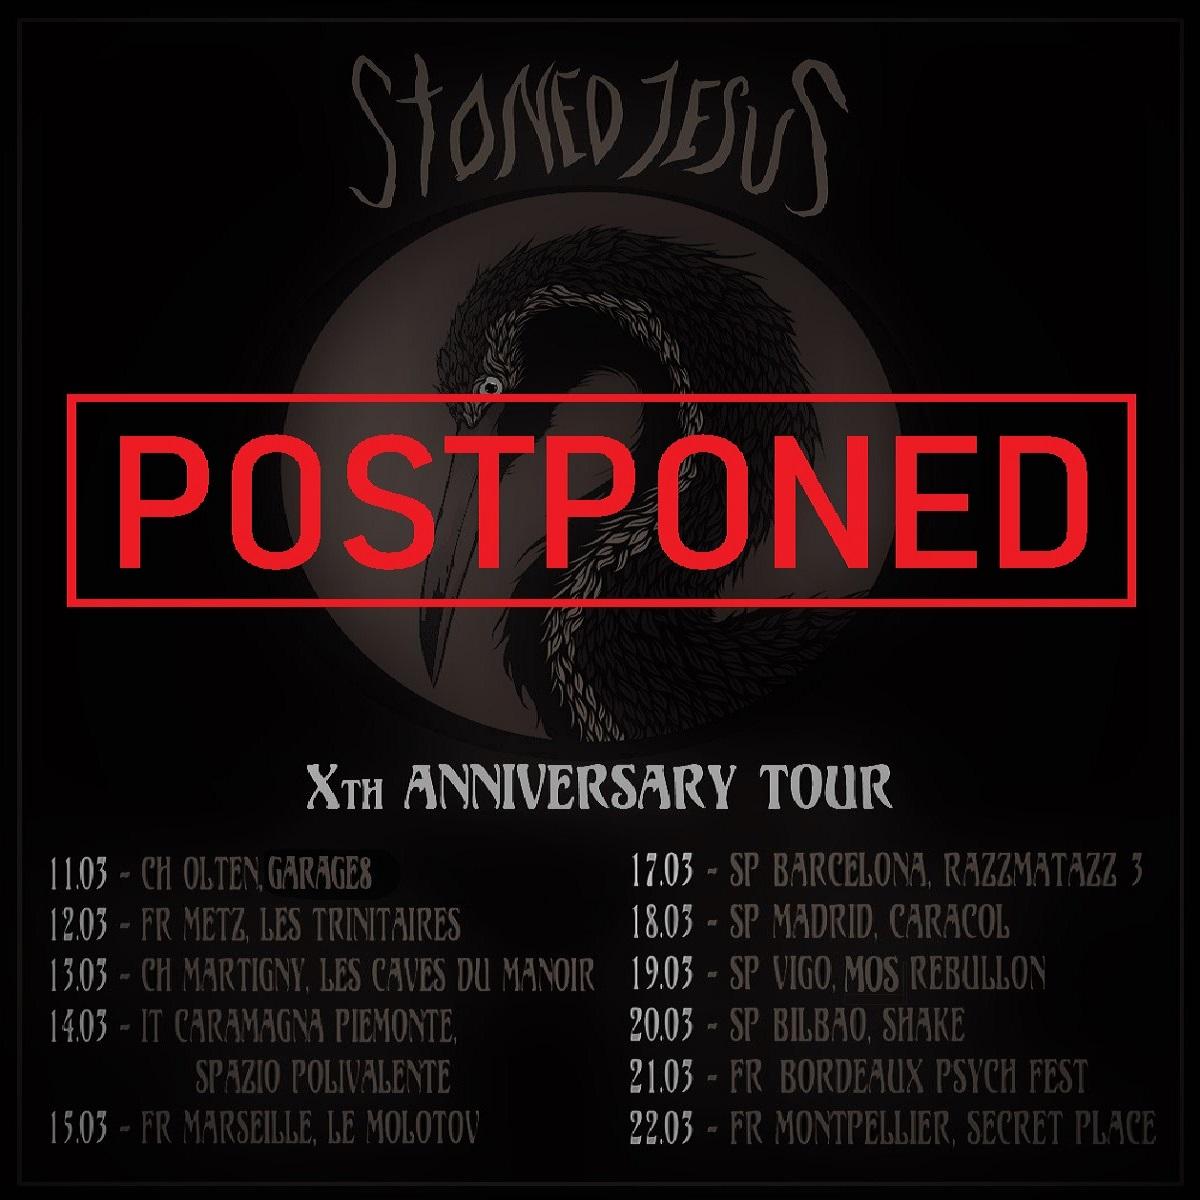 stoned jesus tour postponed